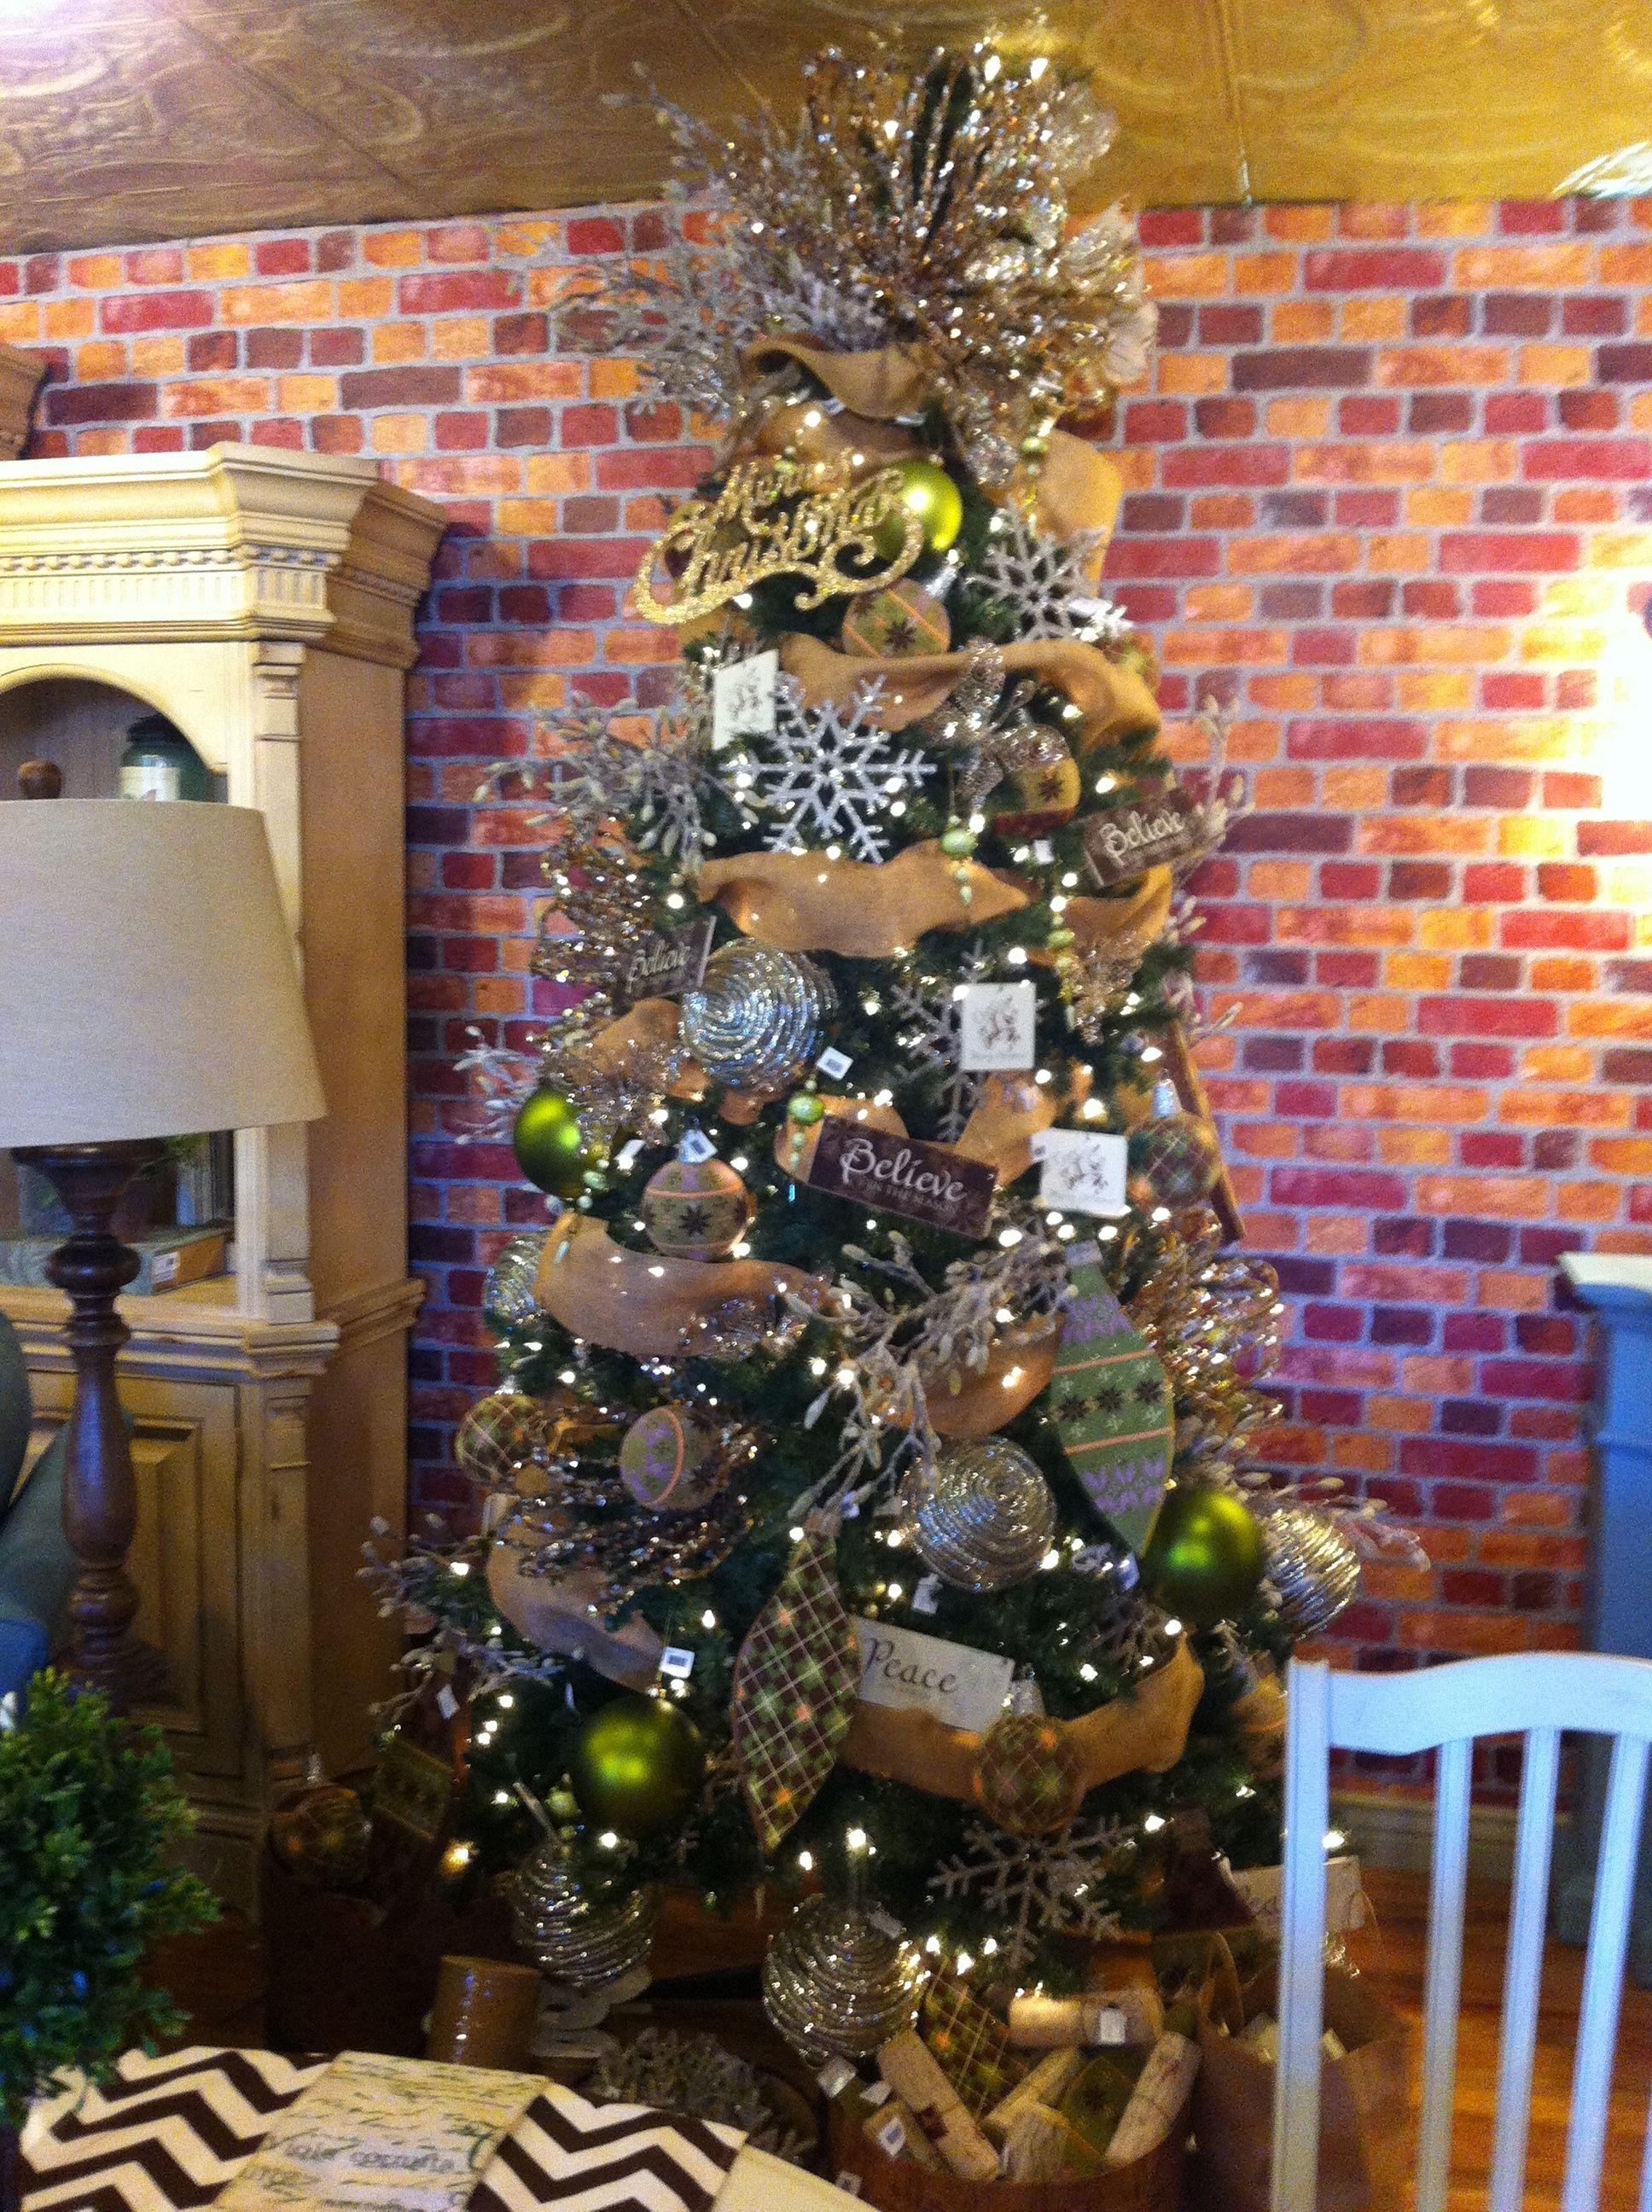 Christmas Decorating At Osmond Designs In Orem And Lehi Utah Http